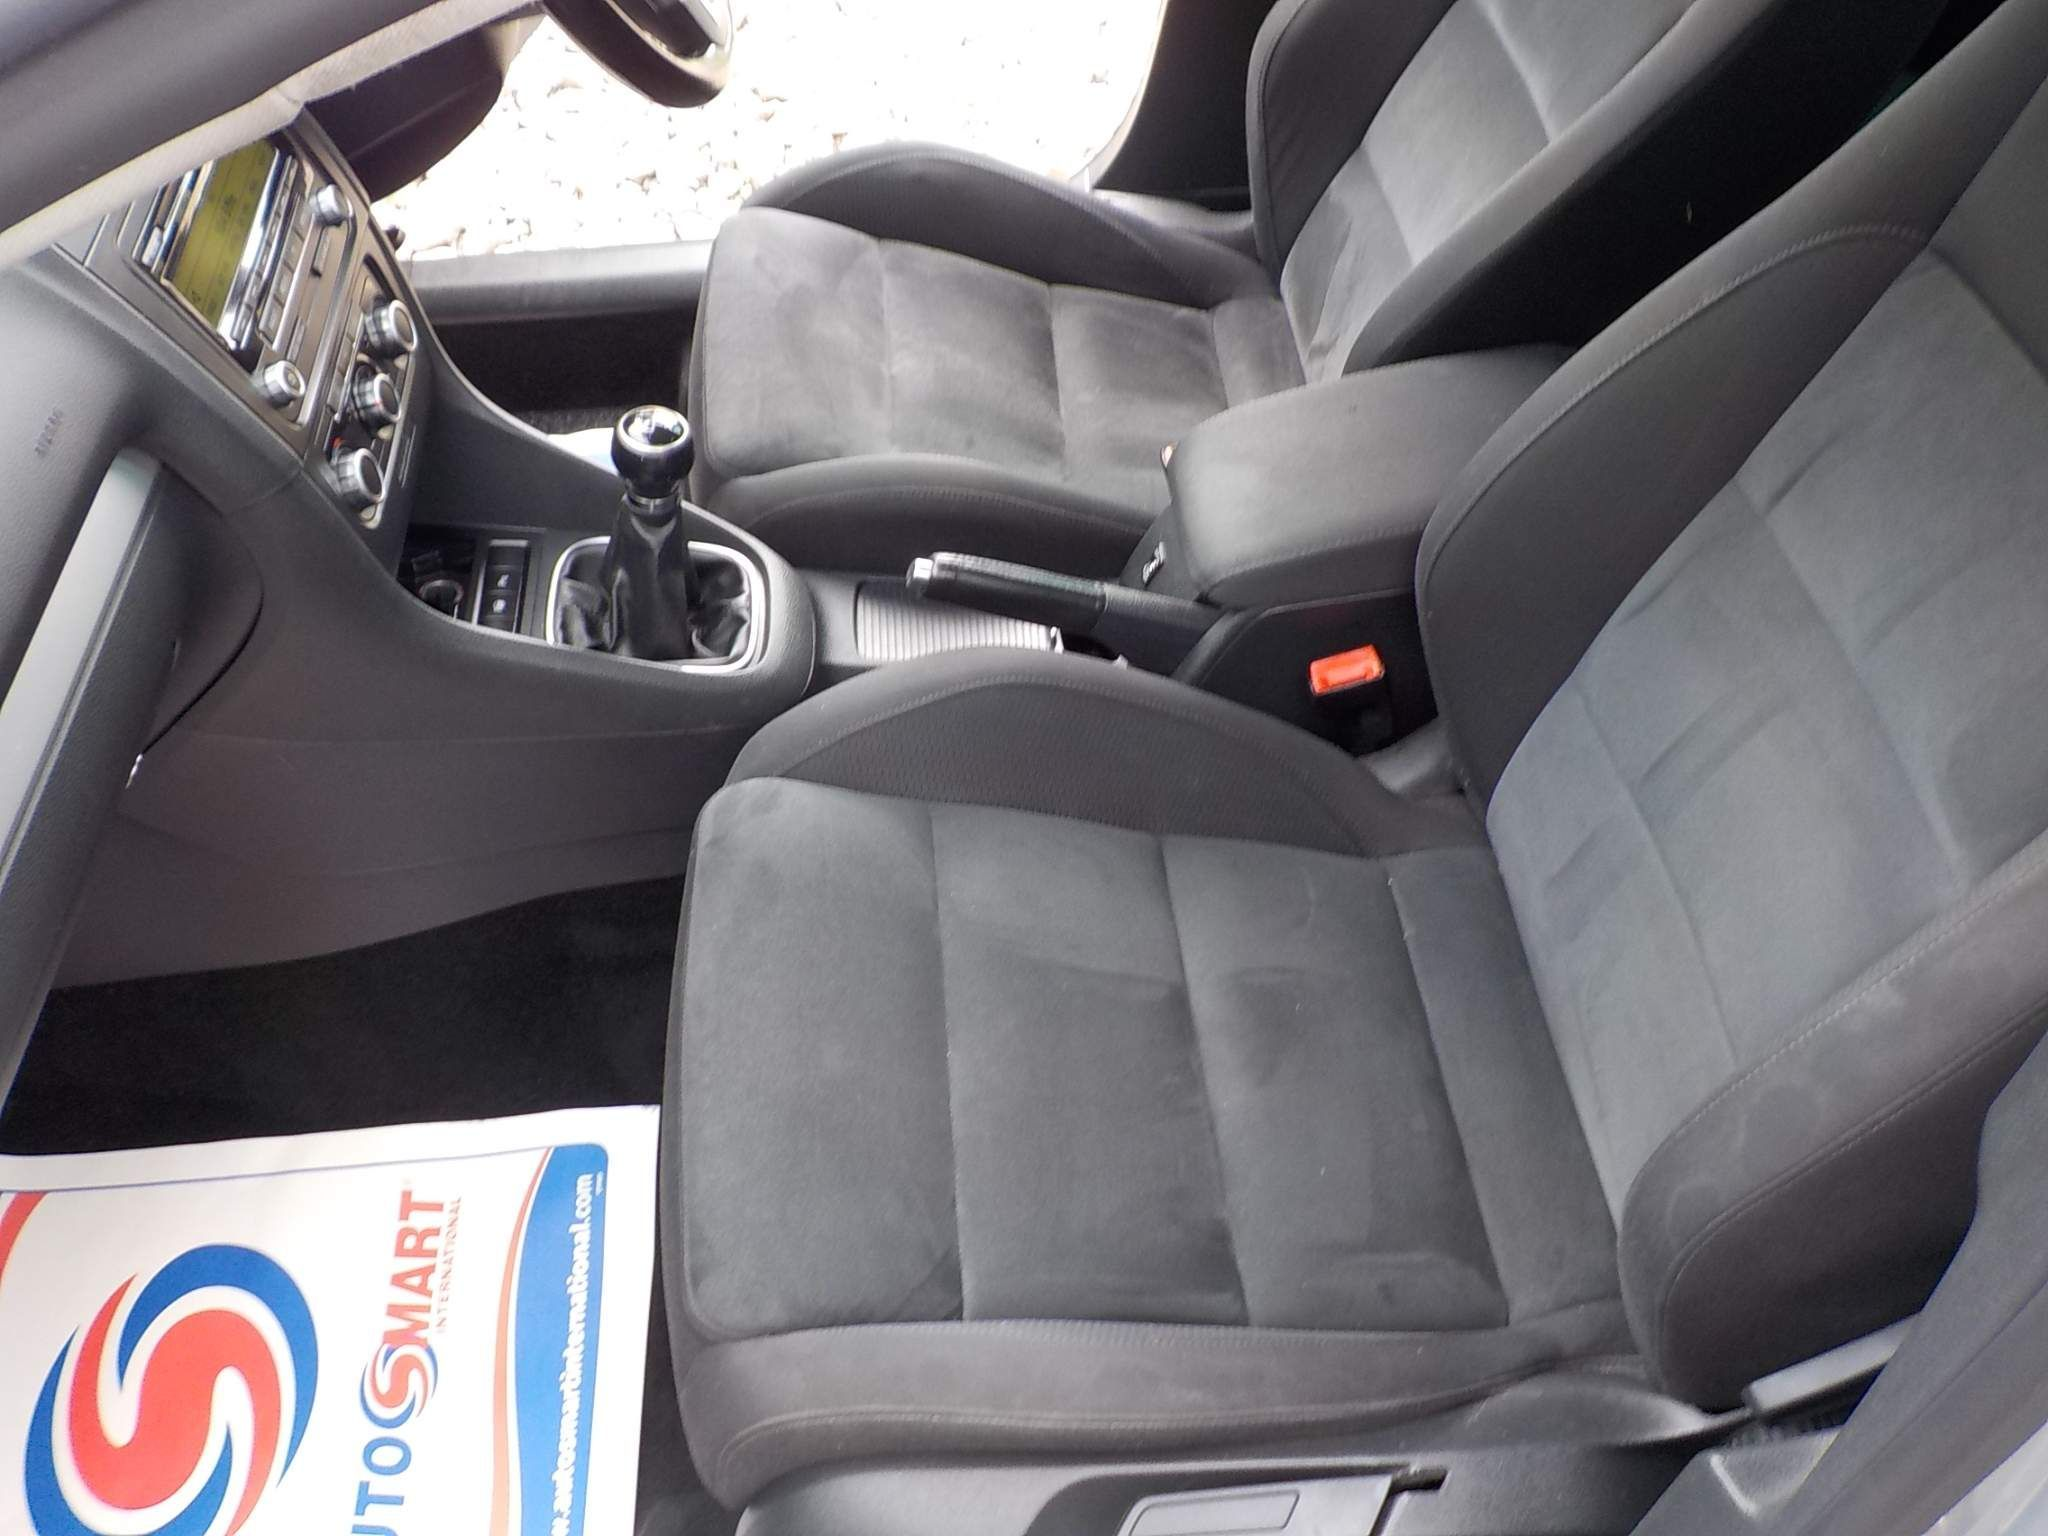 Volkswagen Golf 2.0 TDI GT 5dr